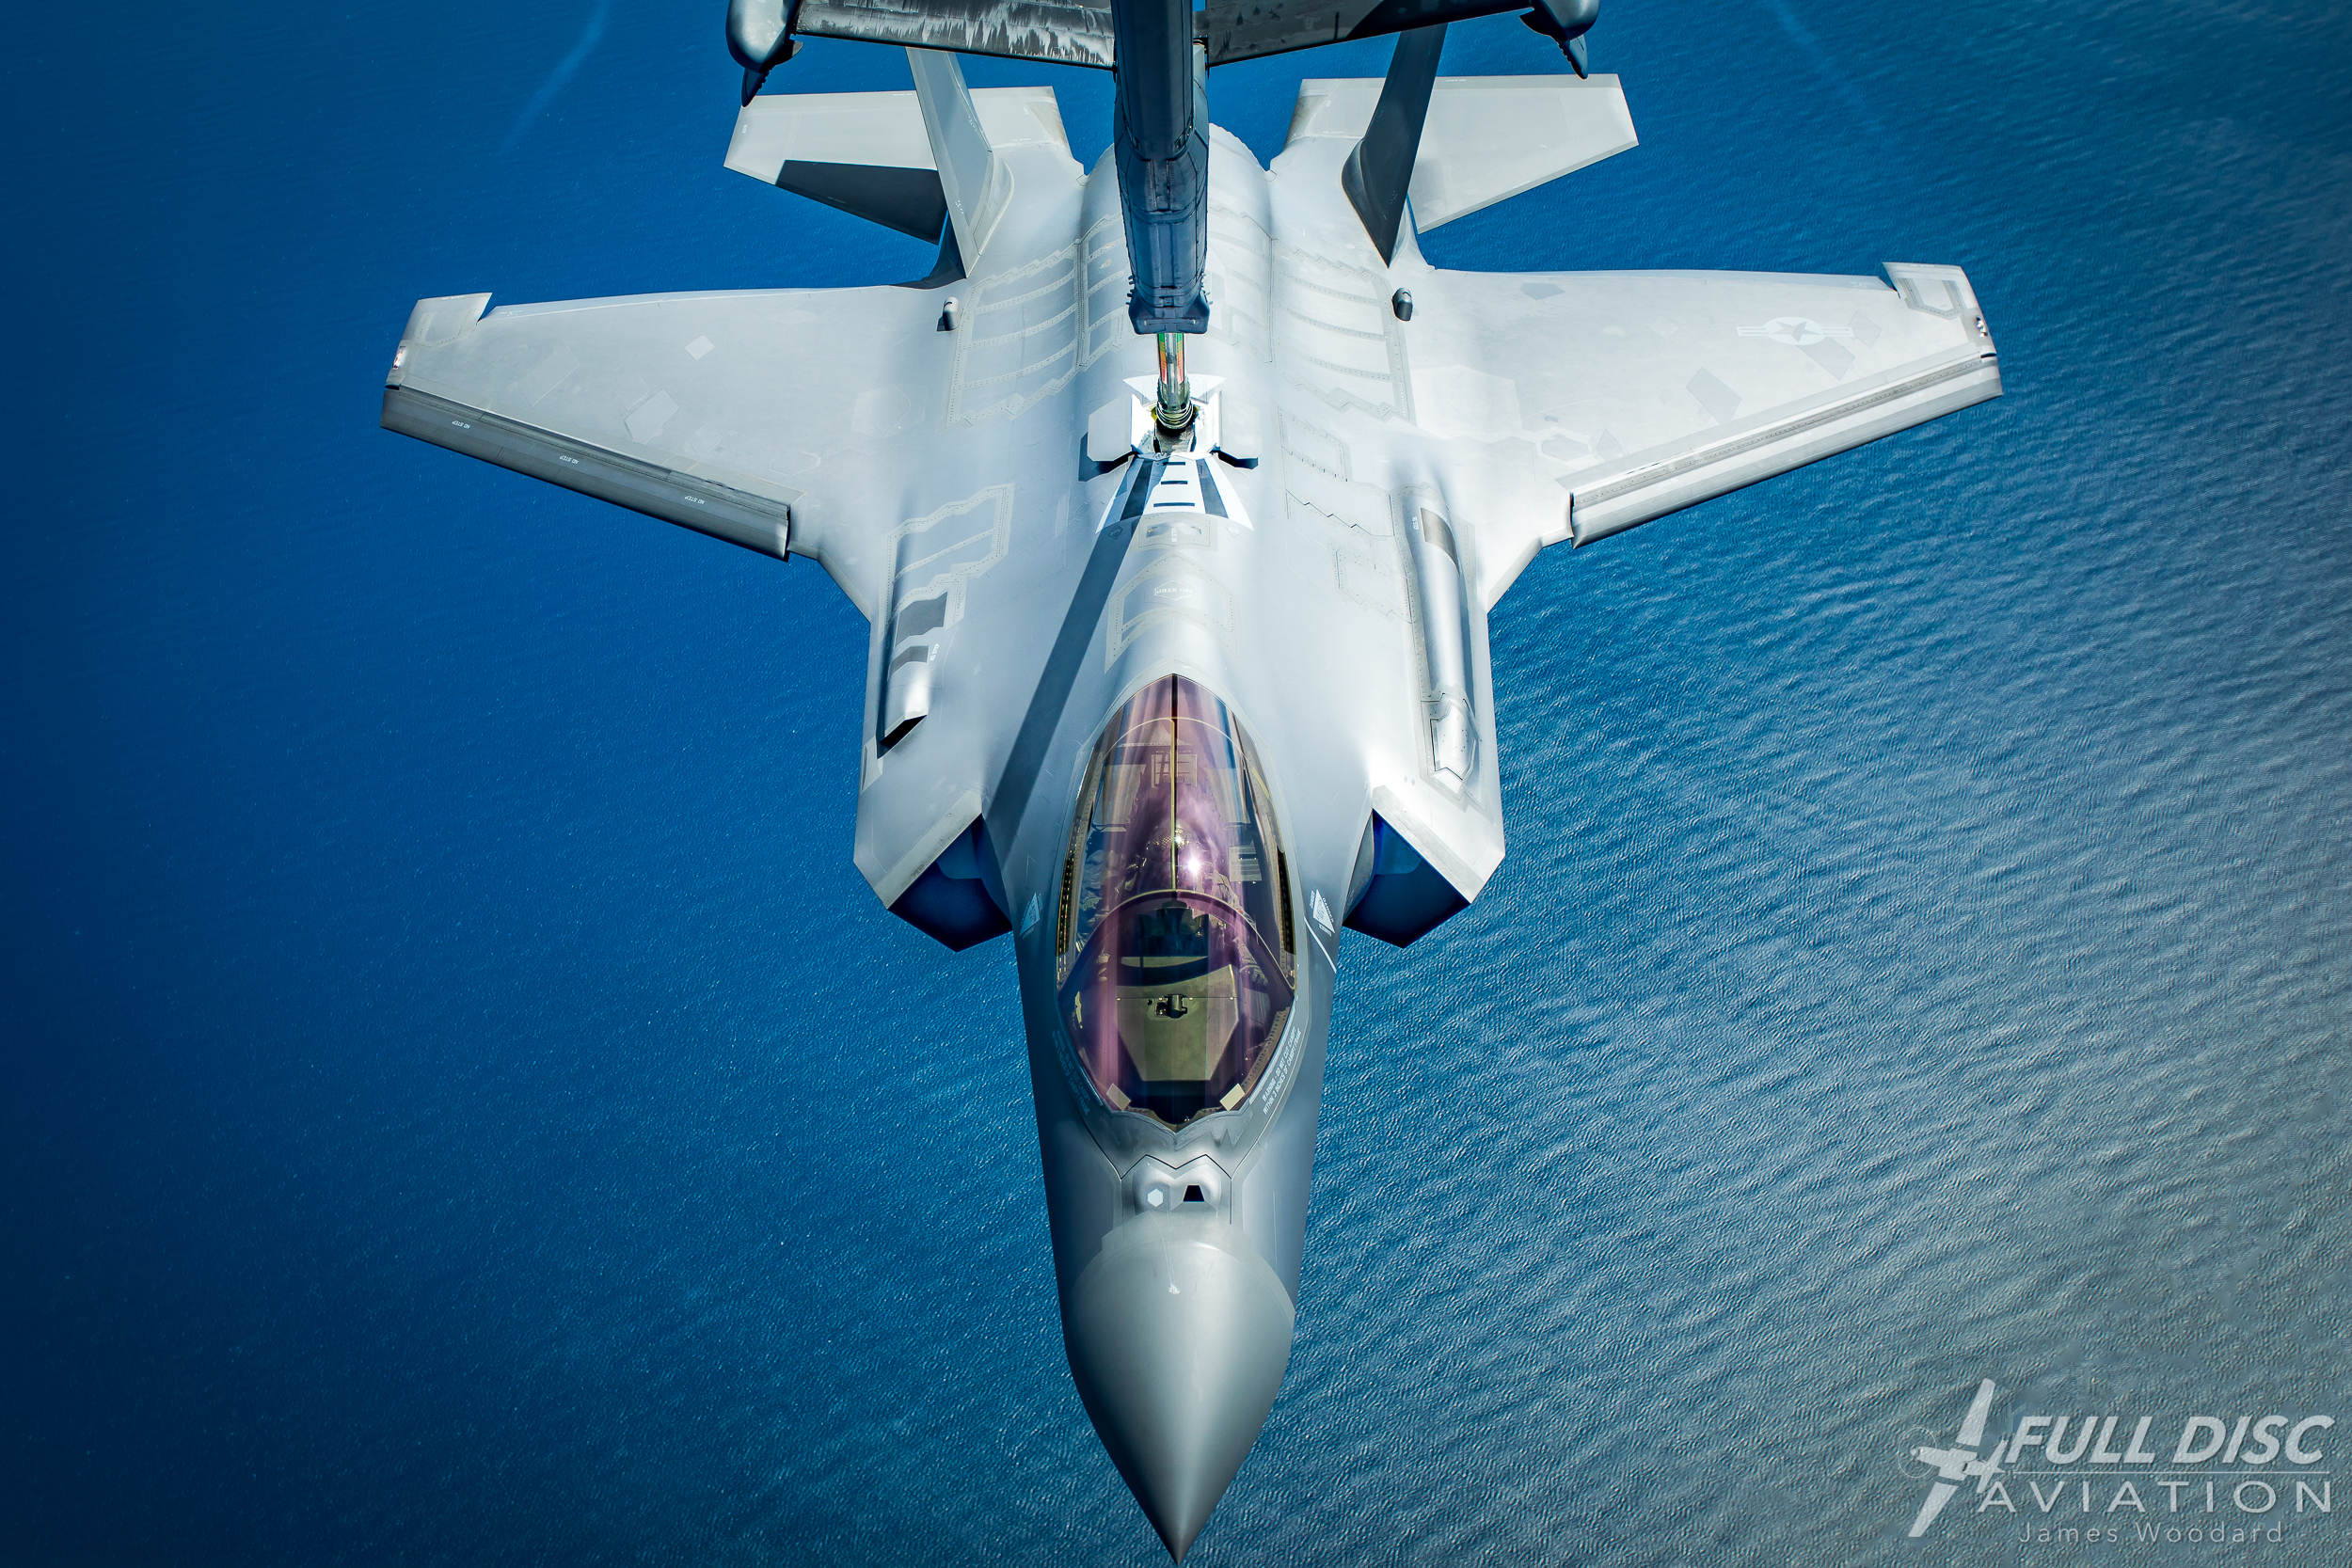 USAFR 70 JW-April 07, 2018-11.jpg